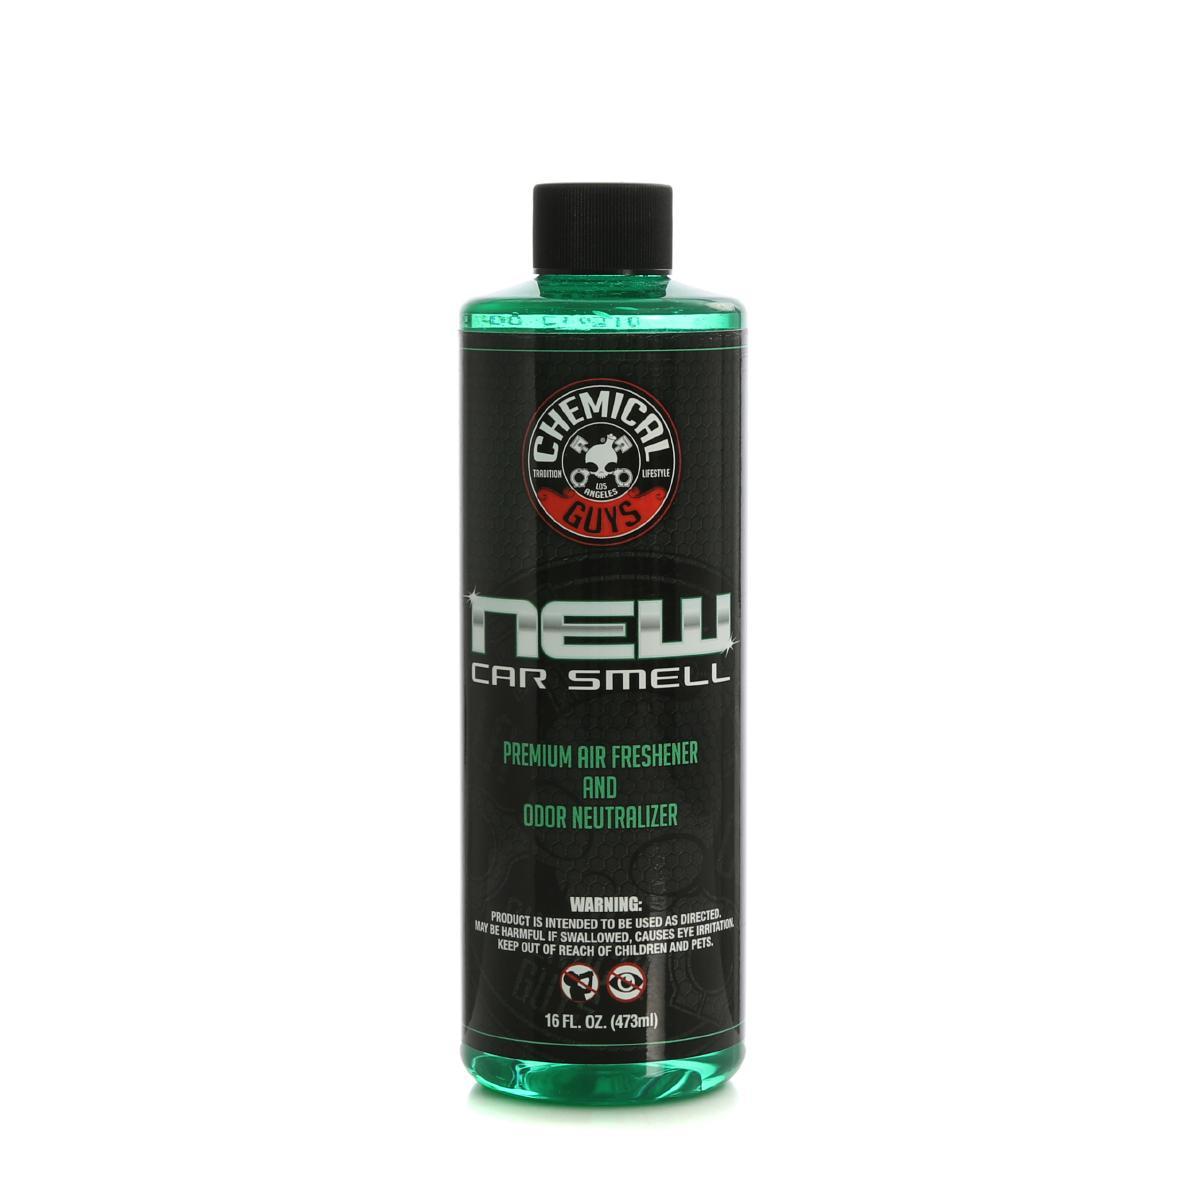 Luktborttagare Chemical Guys New Car Smell, 473 ml